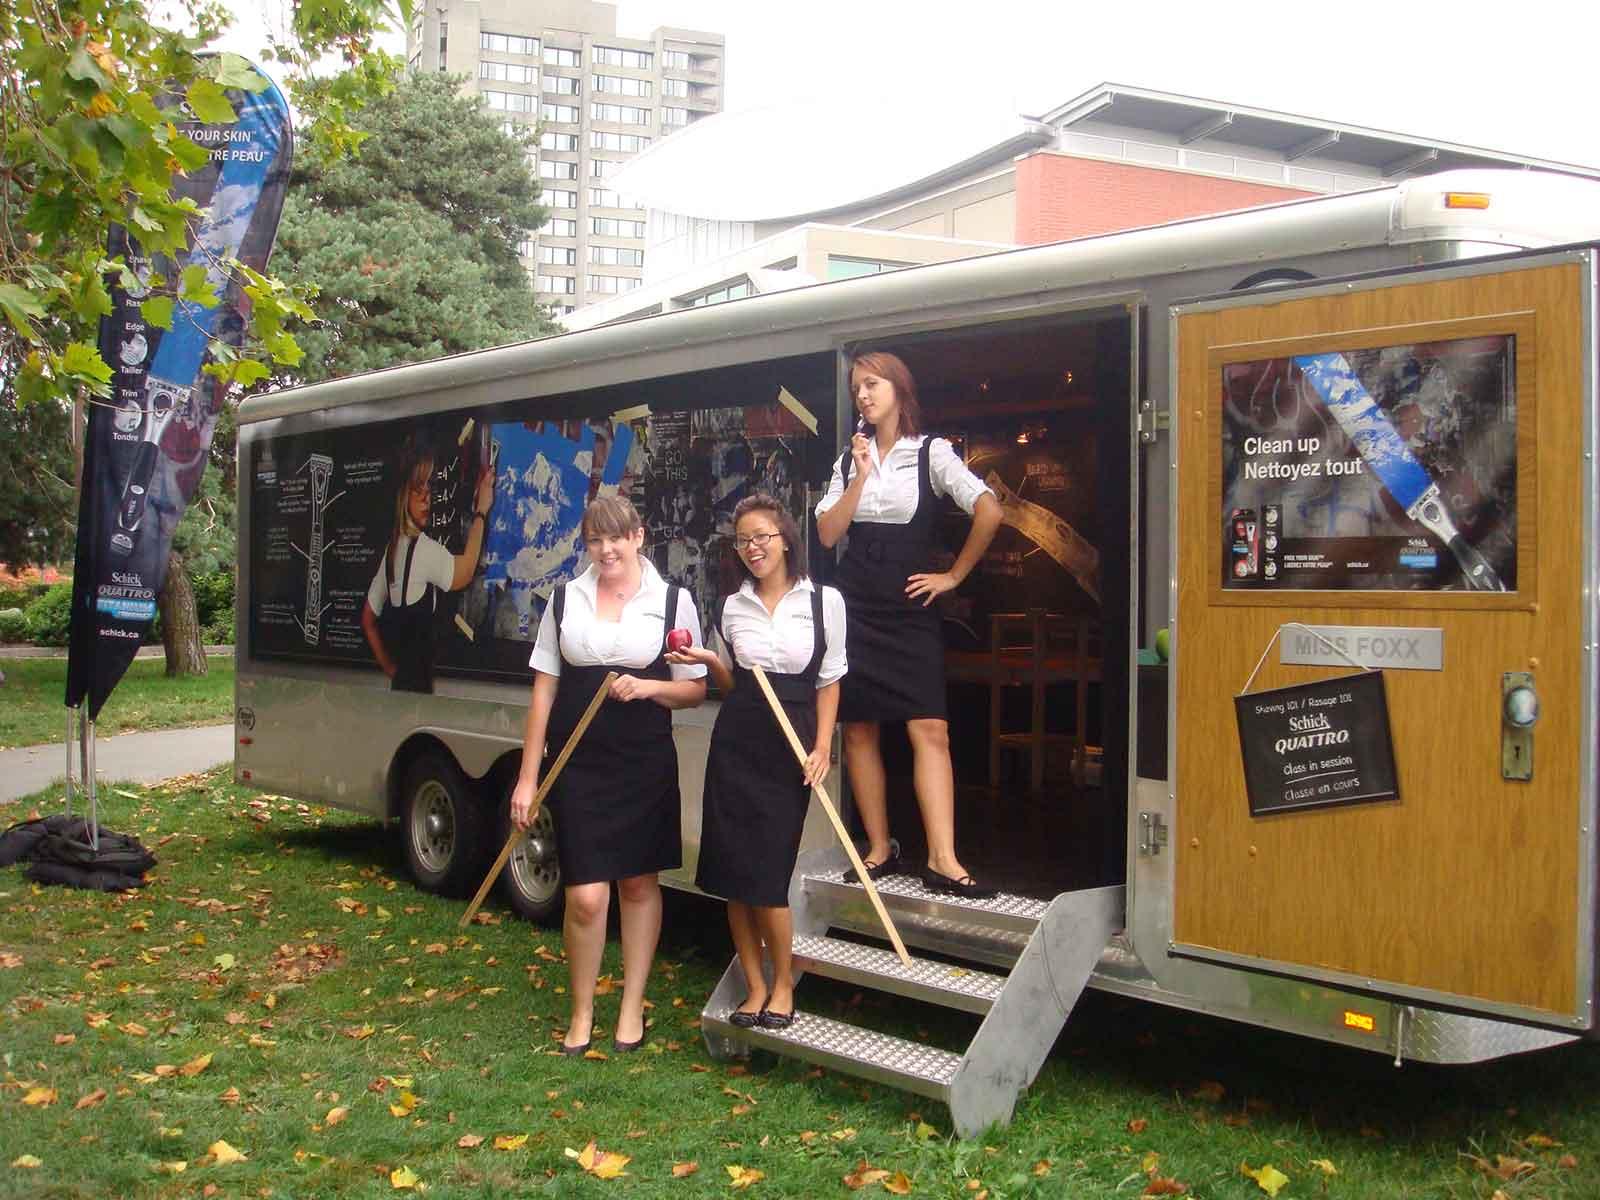 Schick Quattro Mobile Road Tour